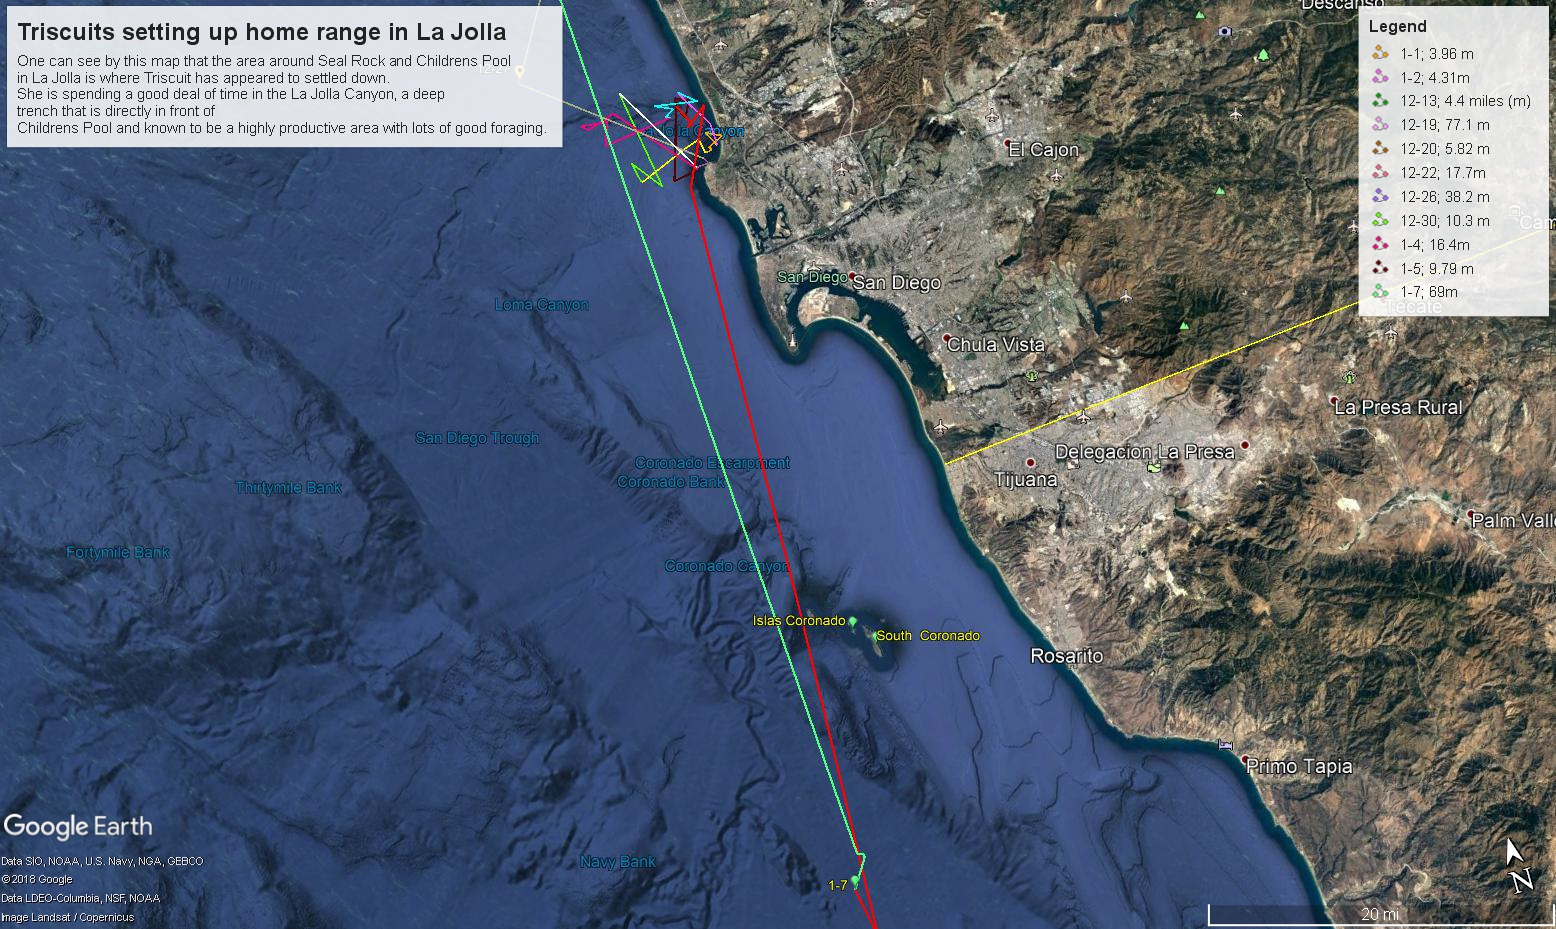 Triscuit range of La Jolla